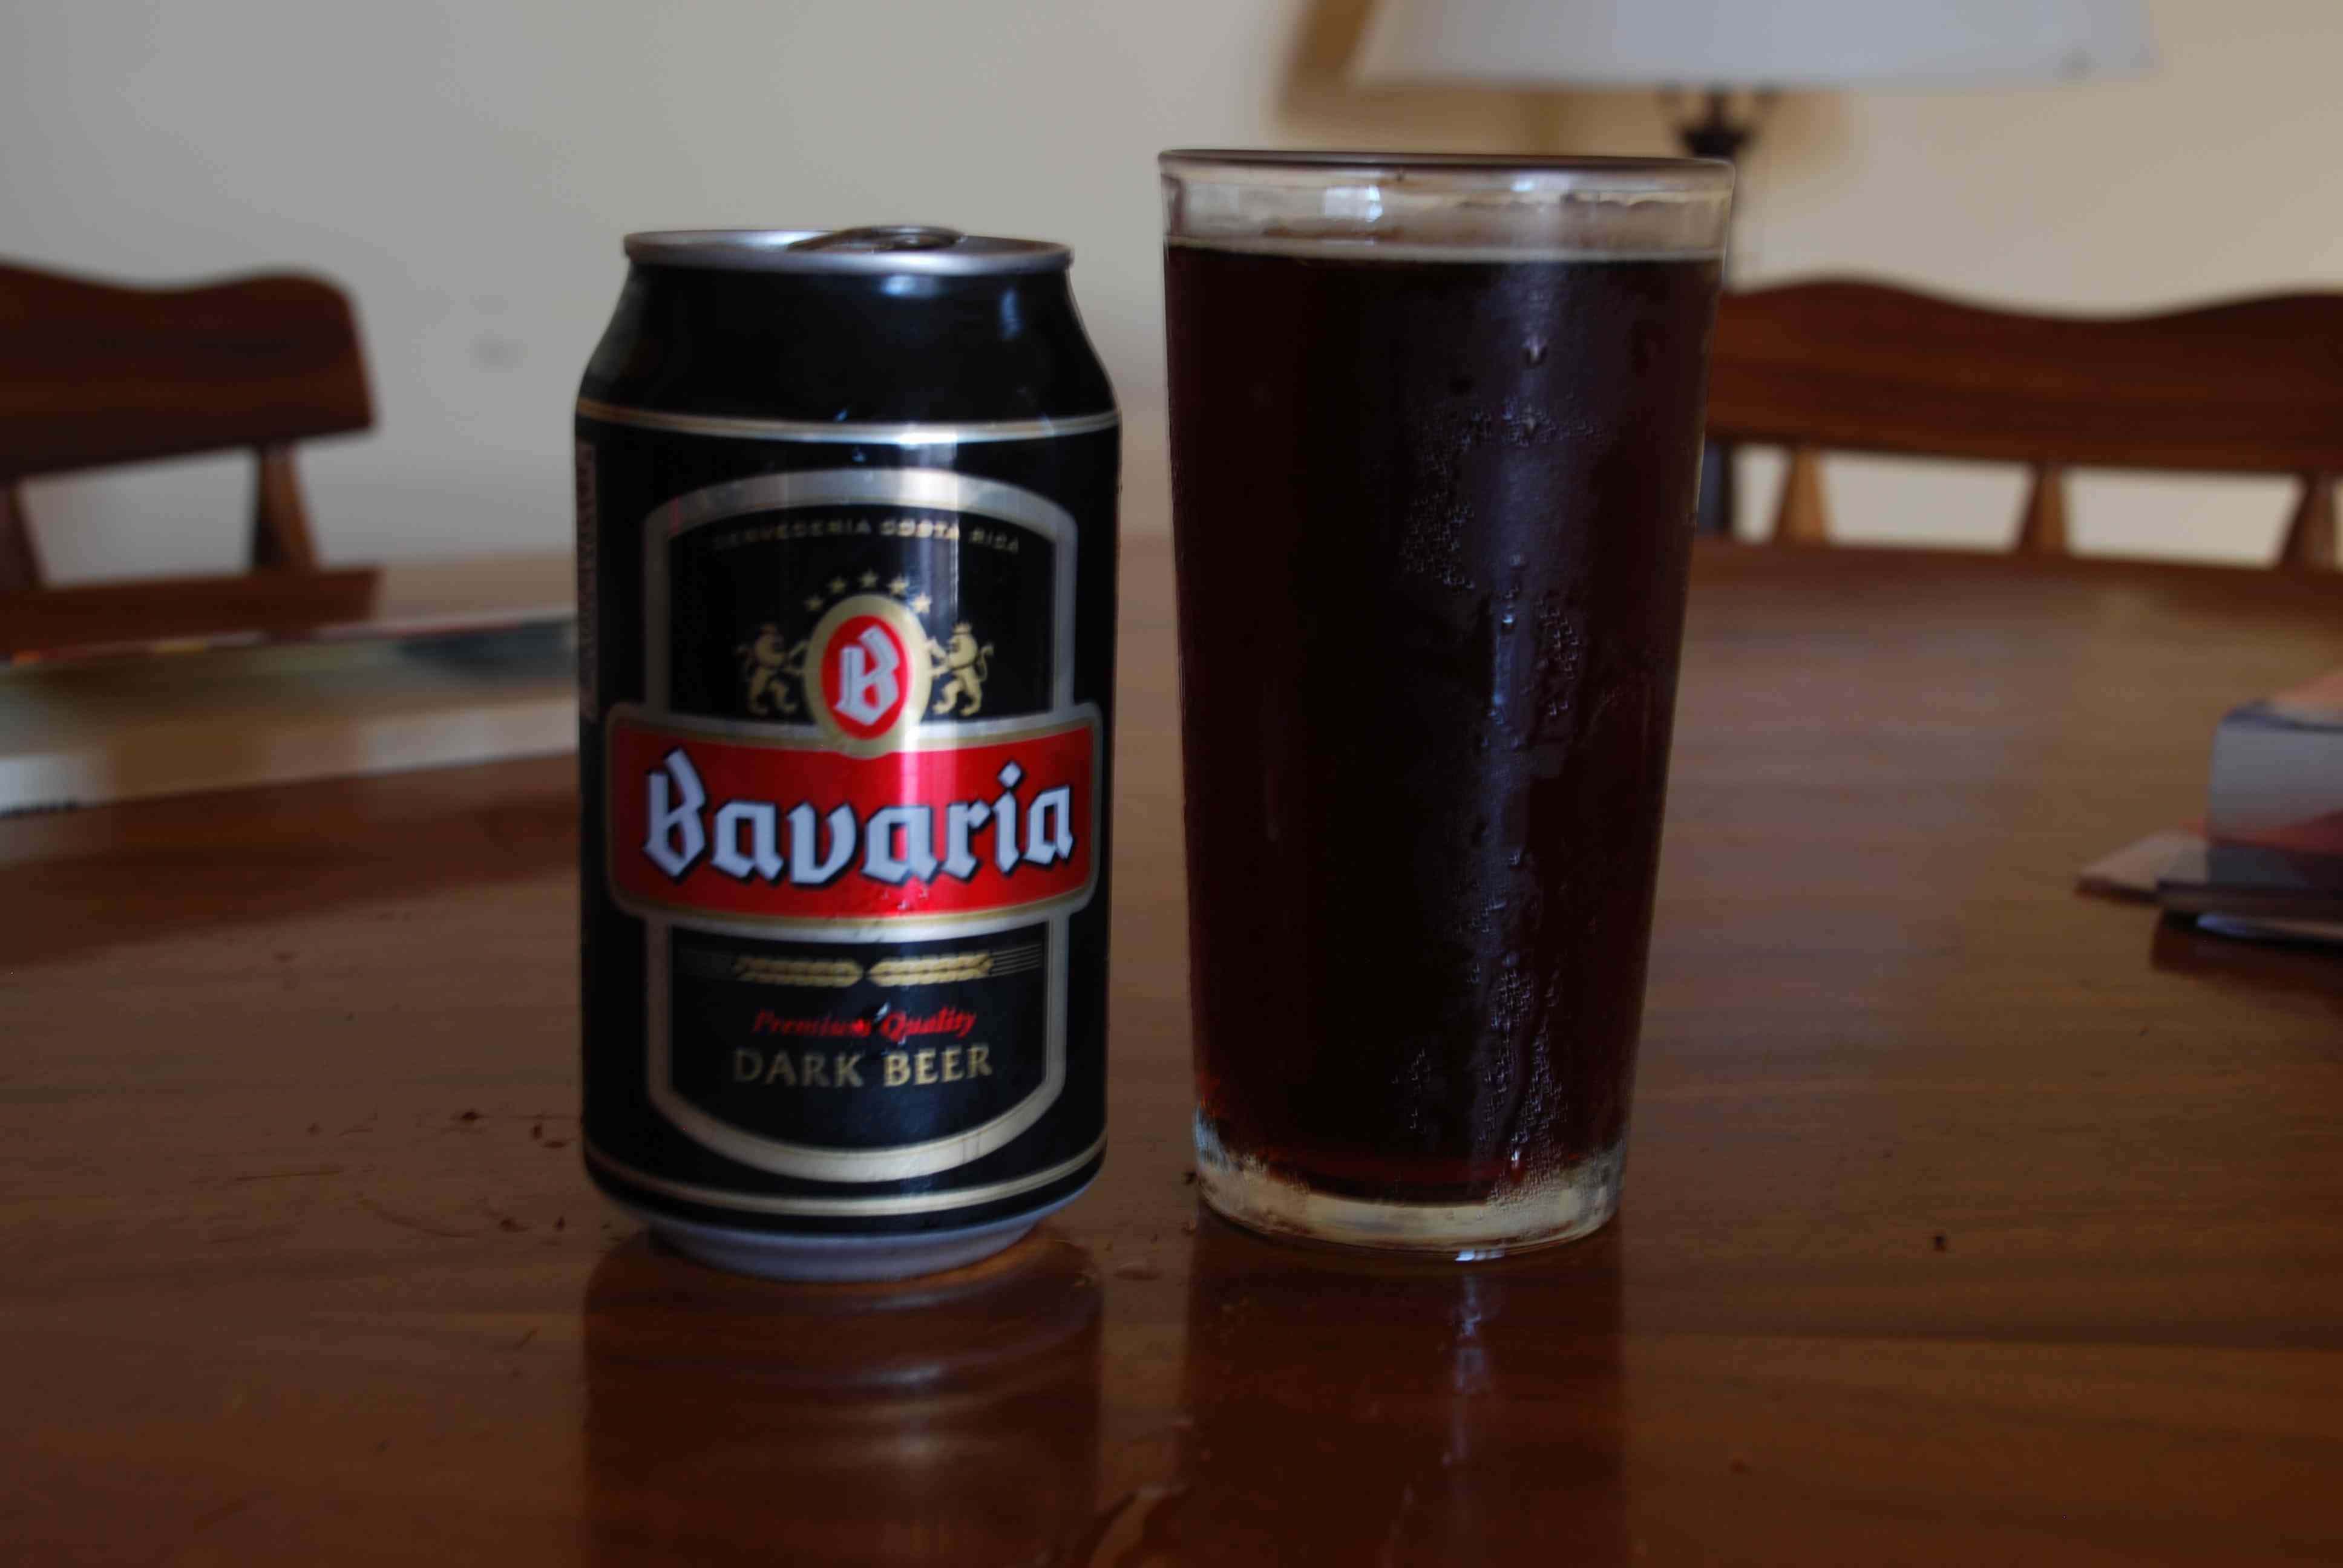 Bavaria dark beer in a clear glass